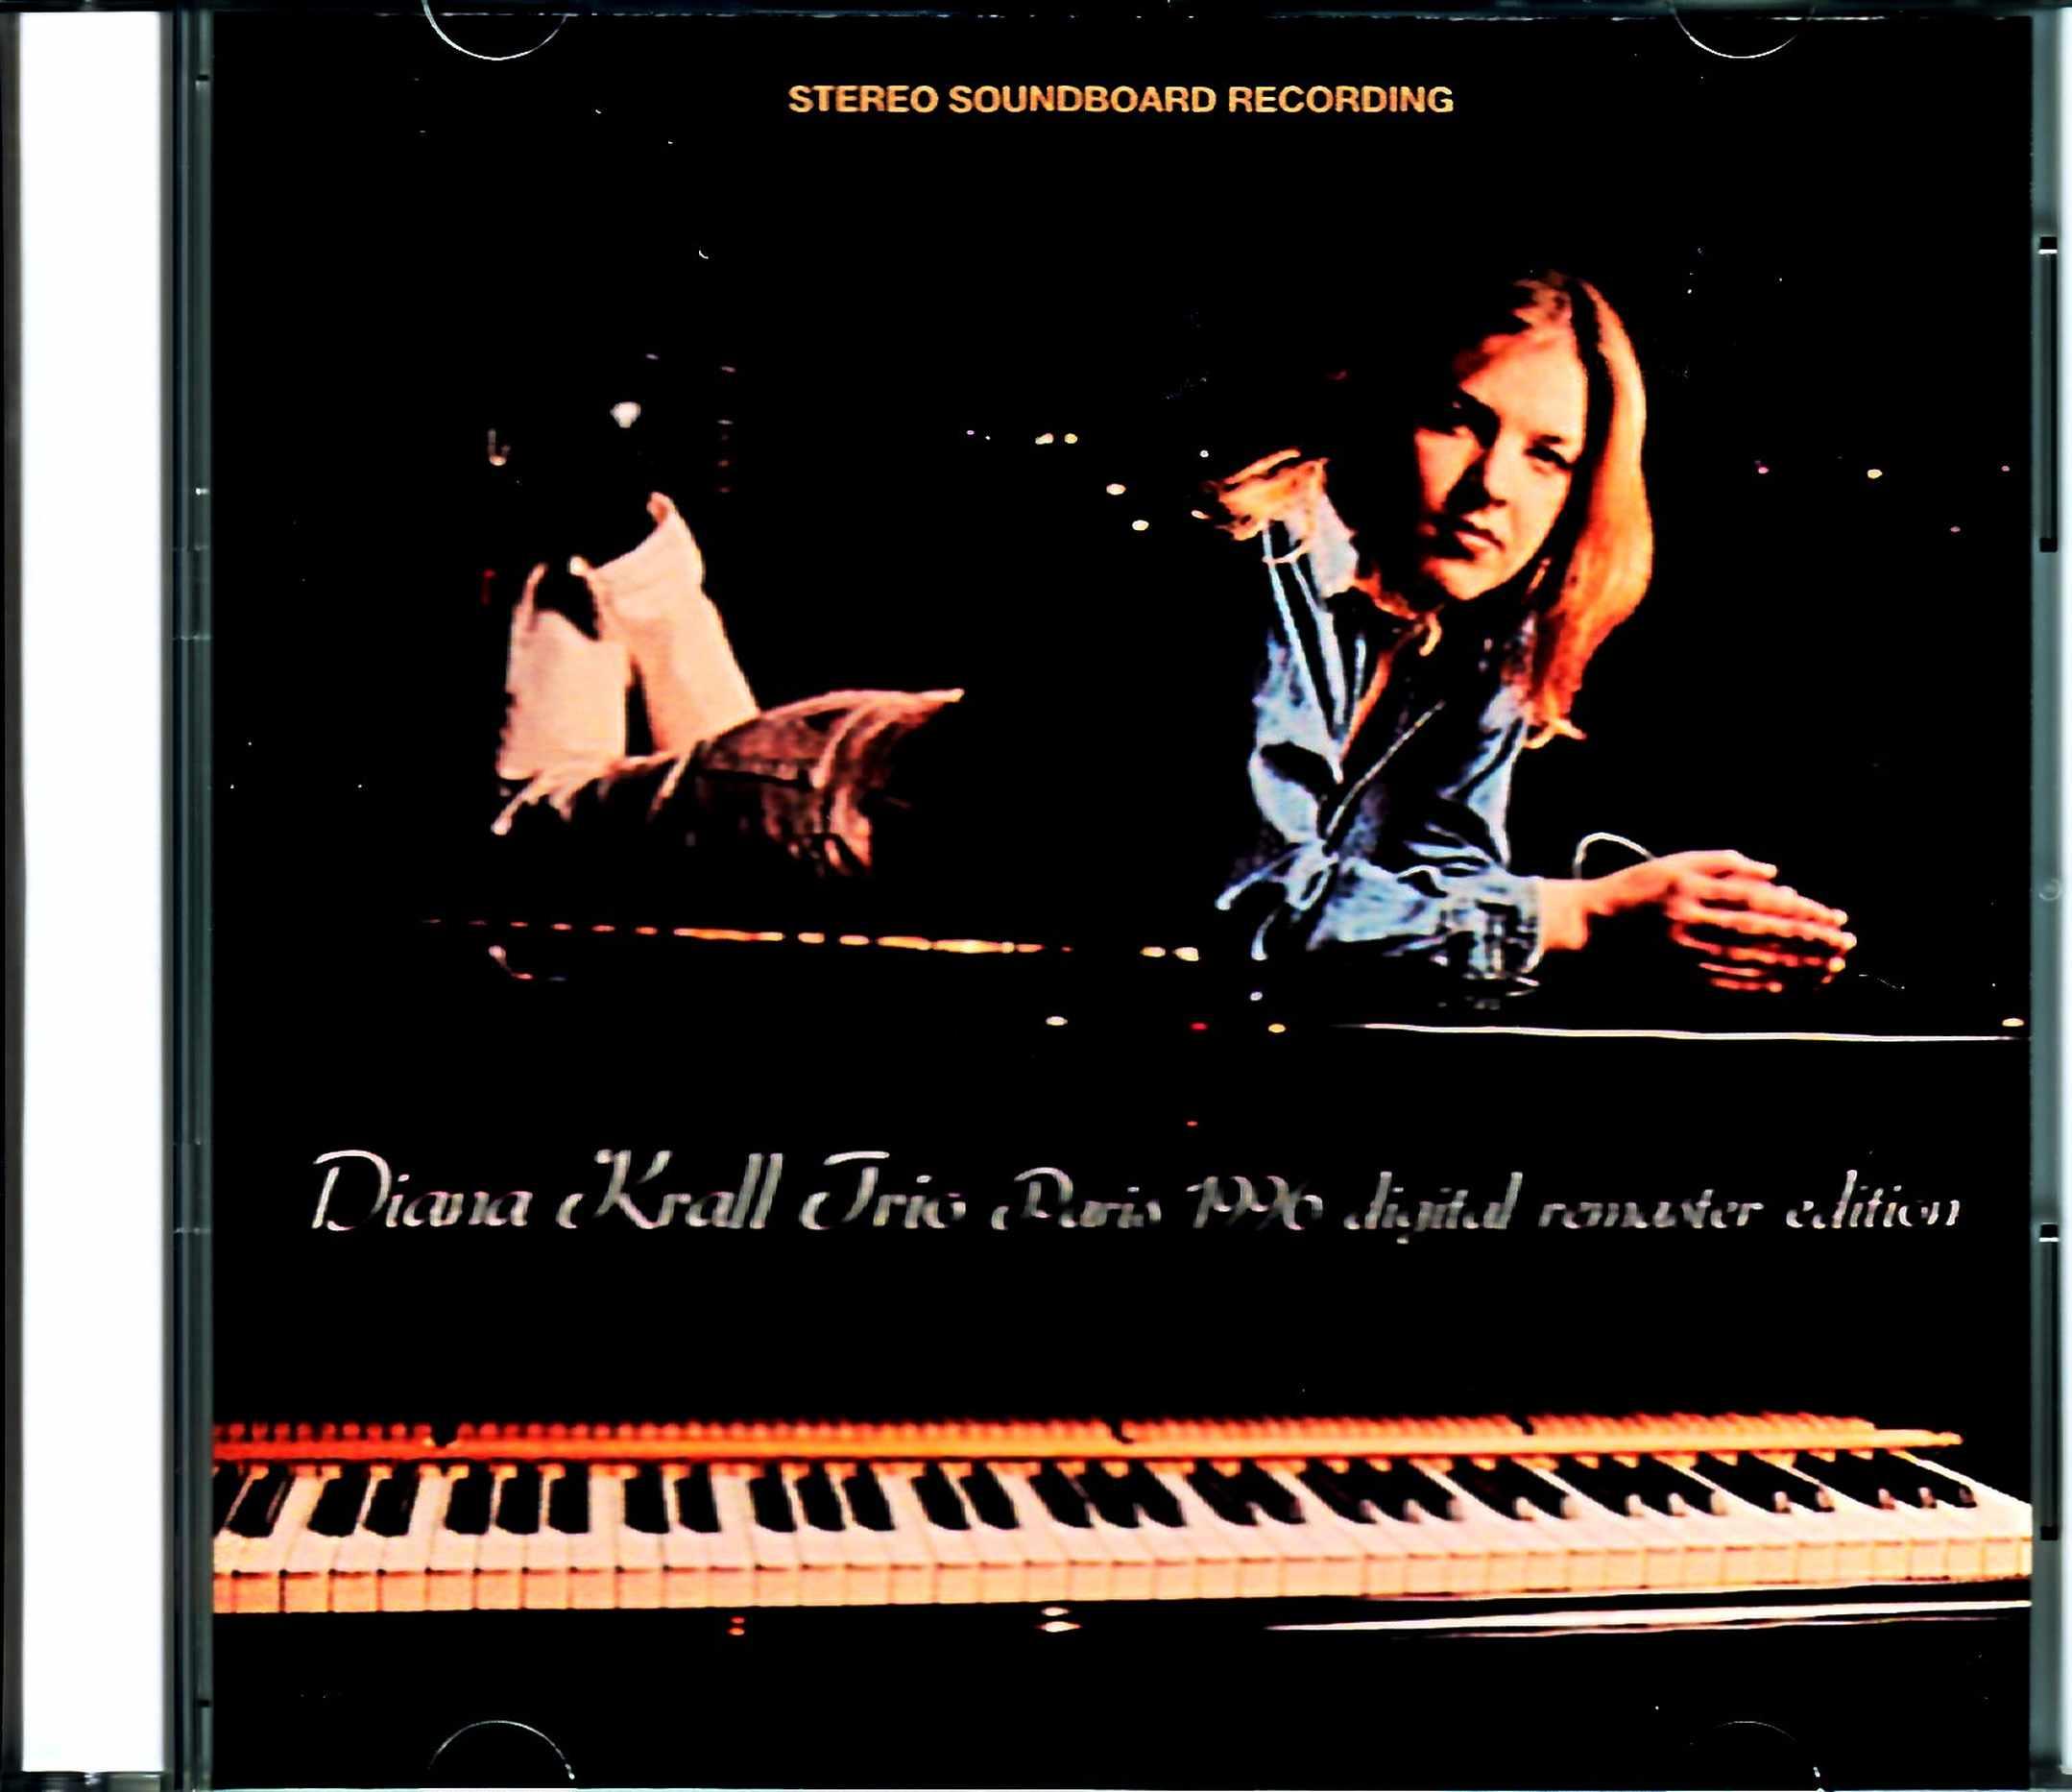 Diana Krall Trio ダイアナ・クラール/France 1996 2021 Digital Remaster